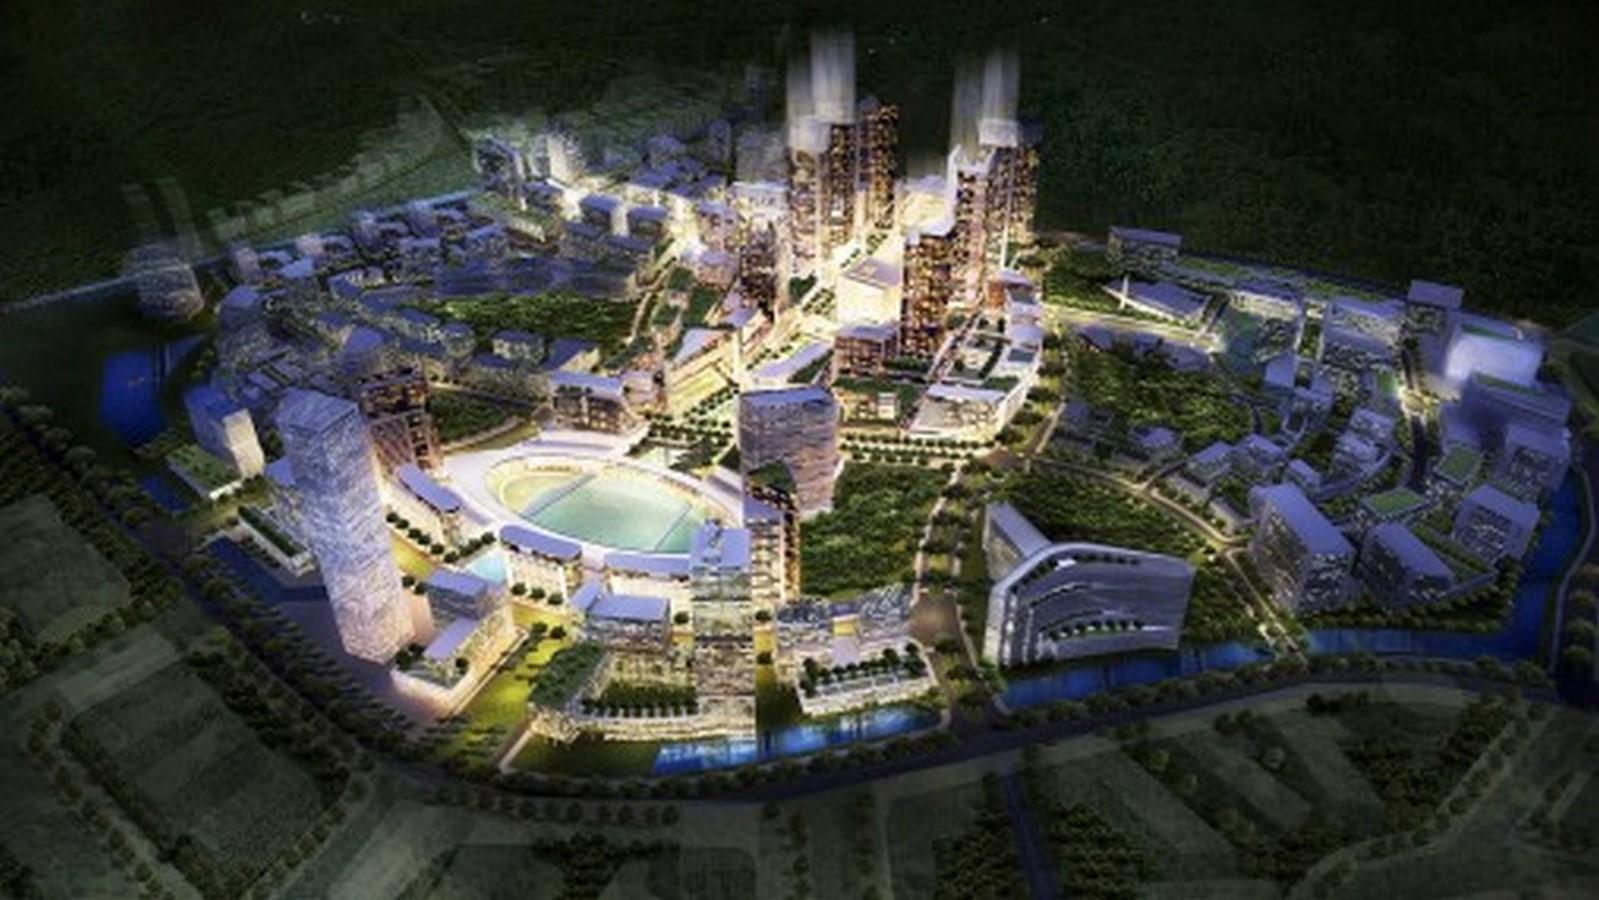 Gensler- 10 Cities & Urban Design Projects Sheet29